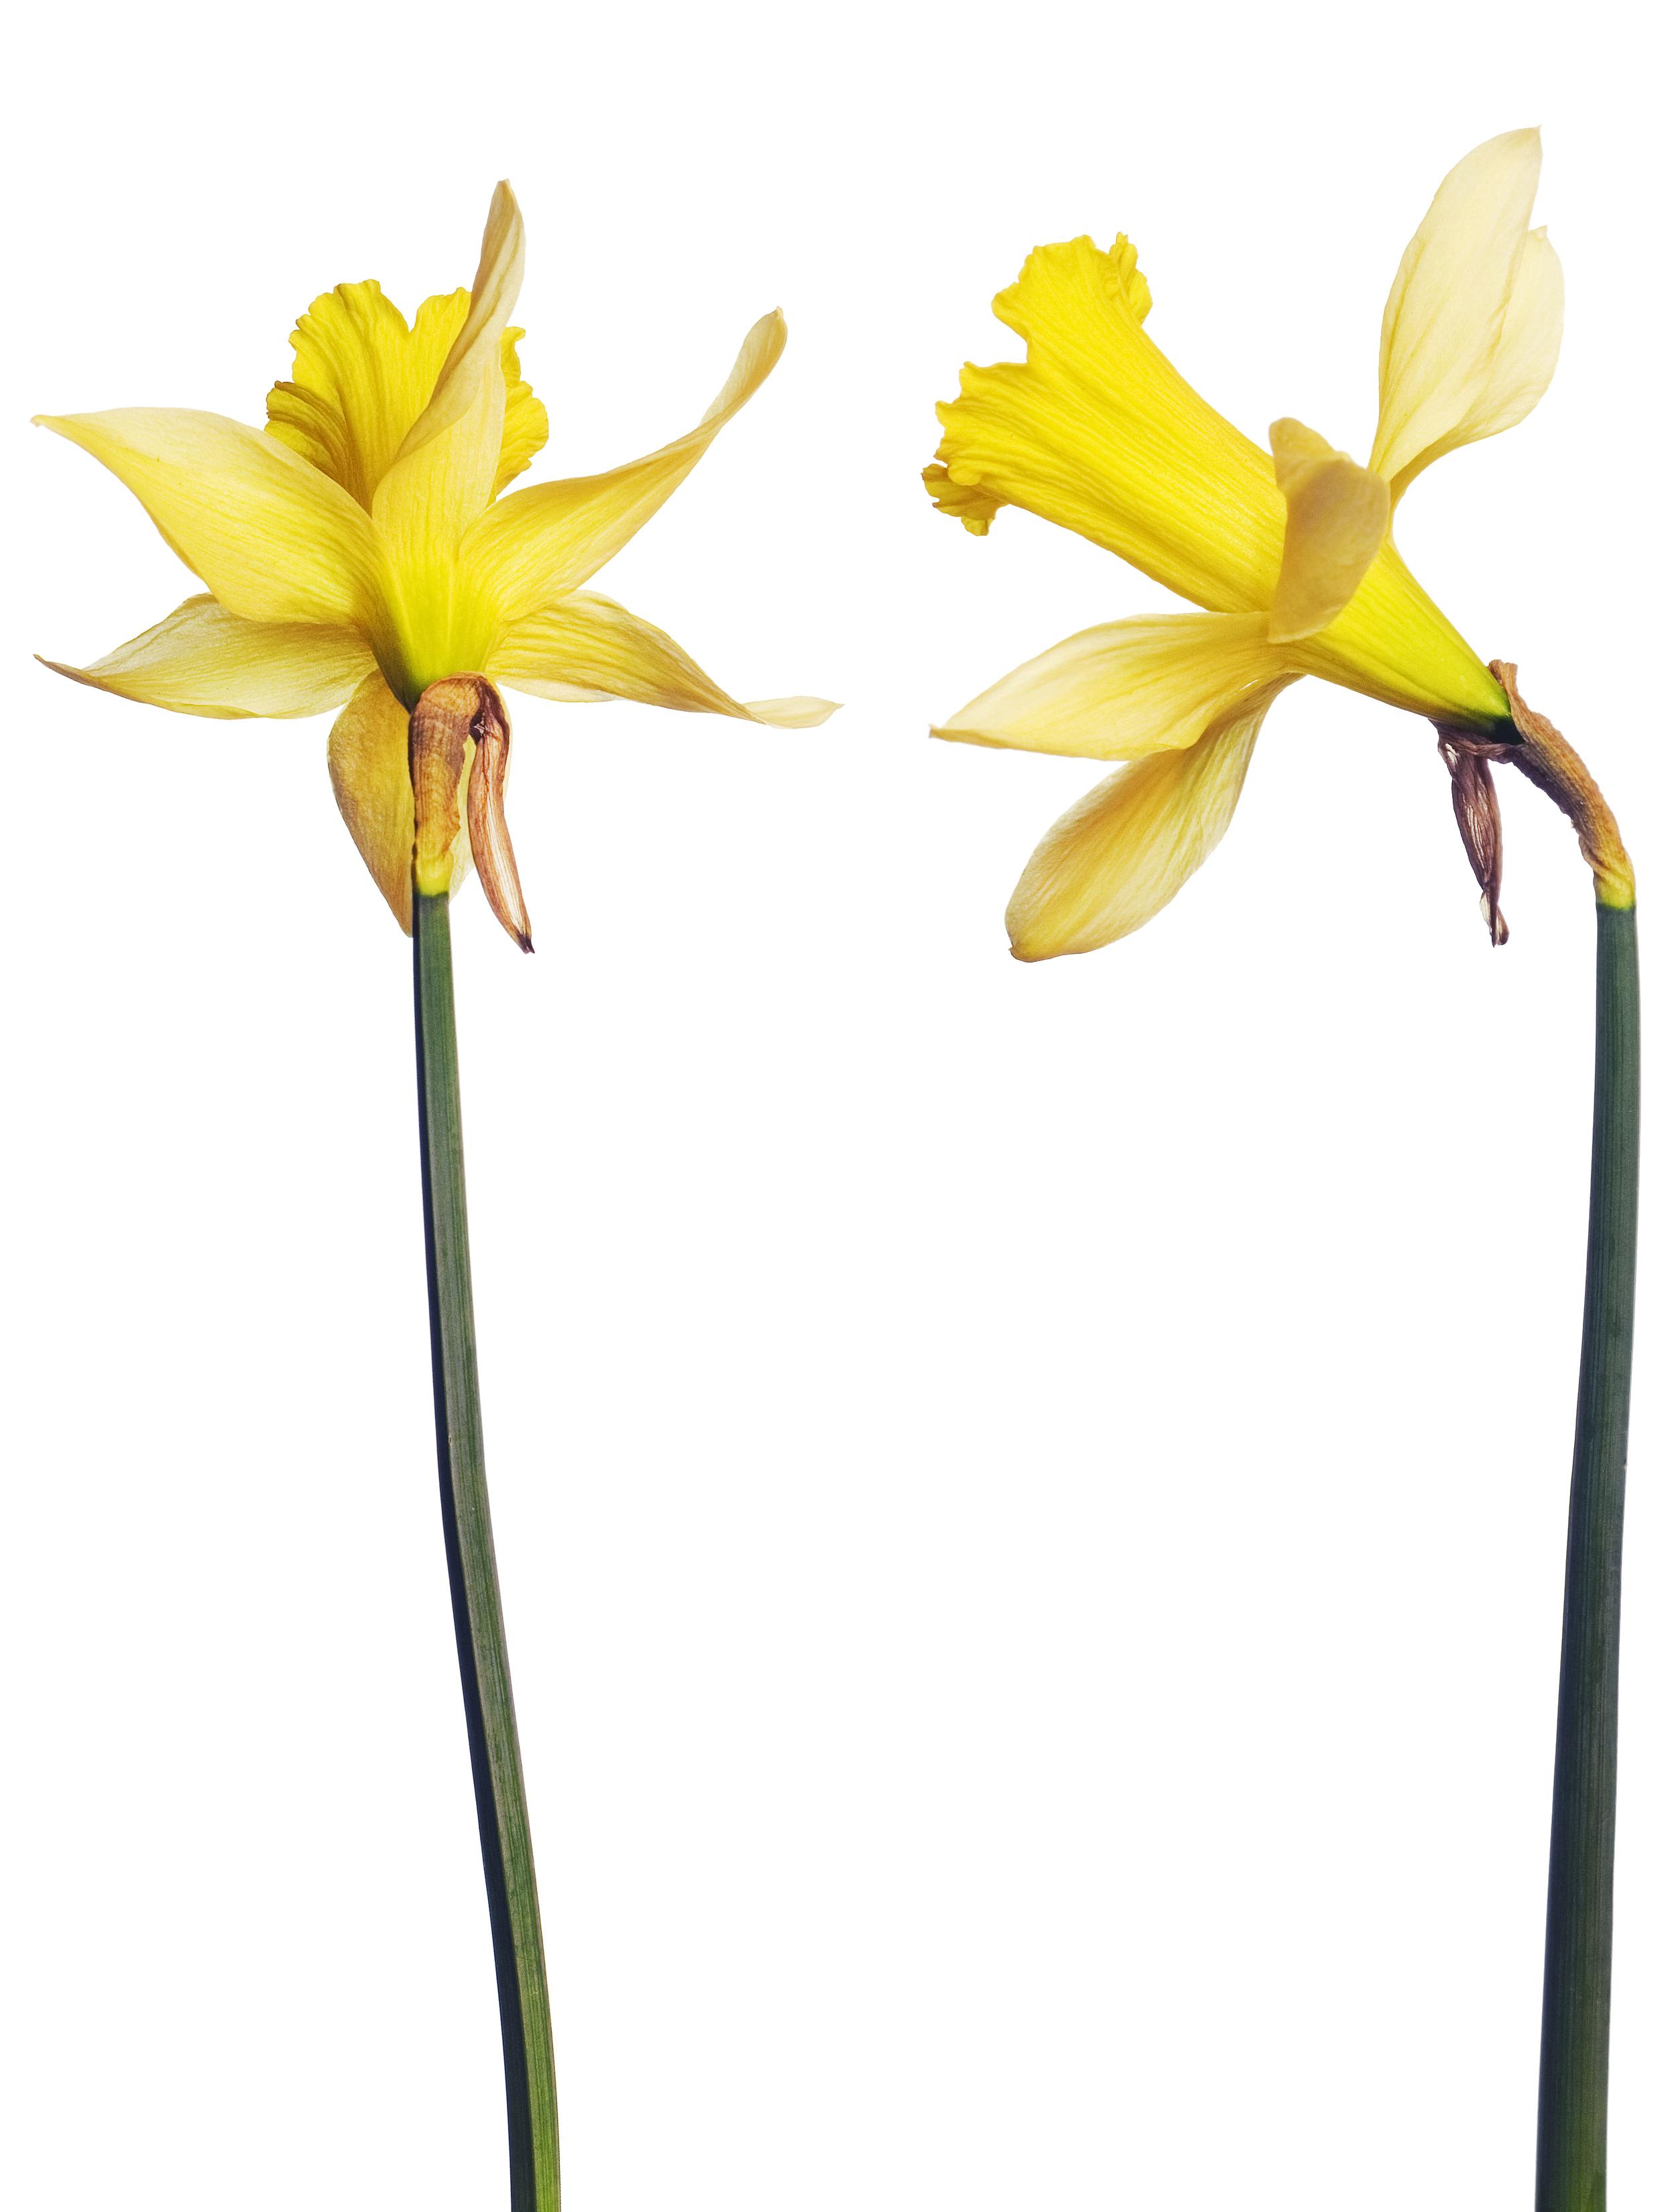 Yellow Flowers, Closeup, Detail, Flora, Floral, HQ Photo